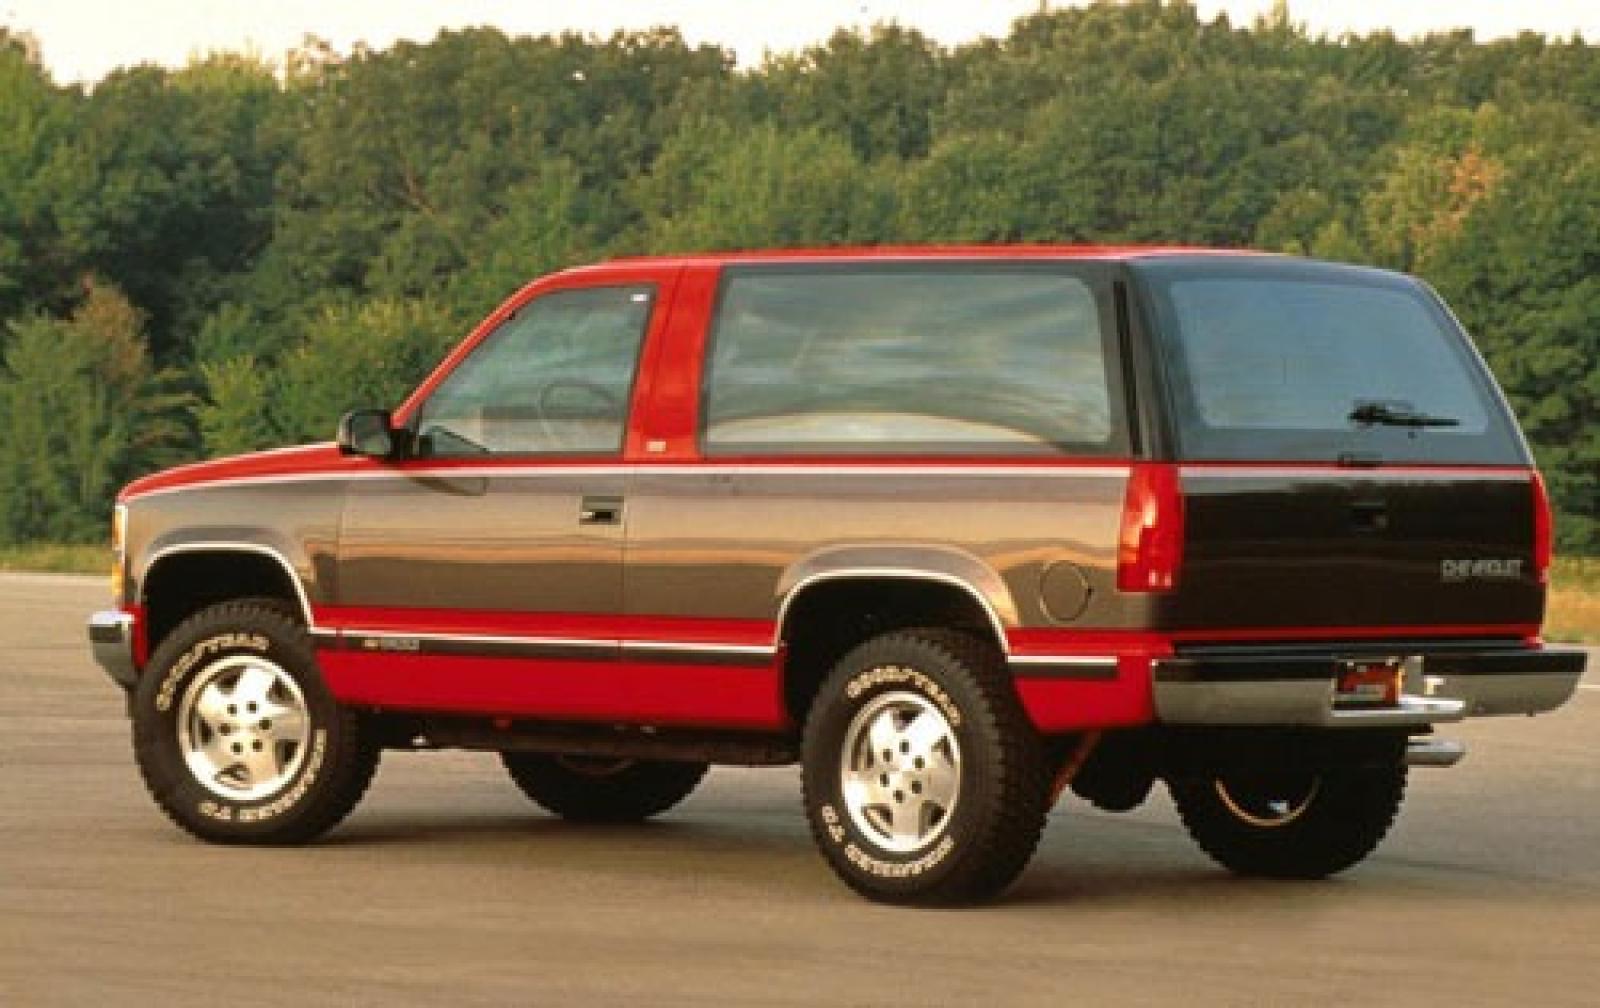 1993 Chevrolet Blazer - Information and photos - Zomb Drive